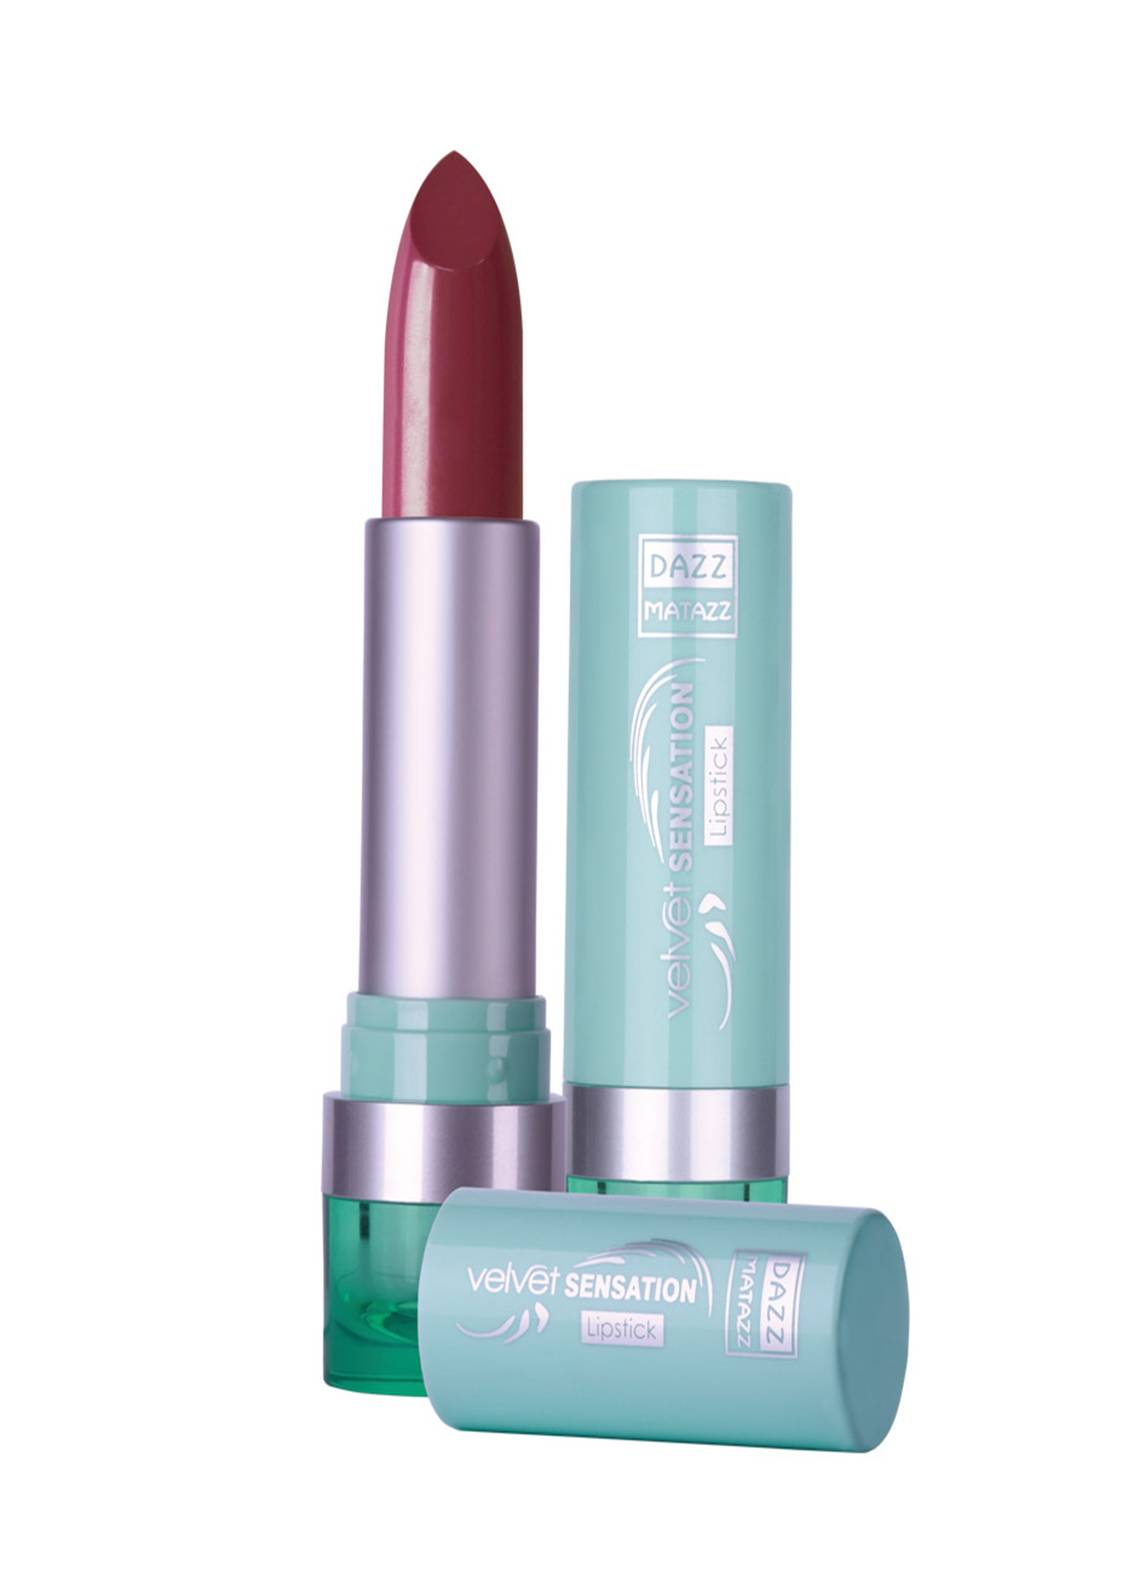 Dazz Matazz Velvet Sensation Lipstick-07 PEANUT BUTTER CUP